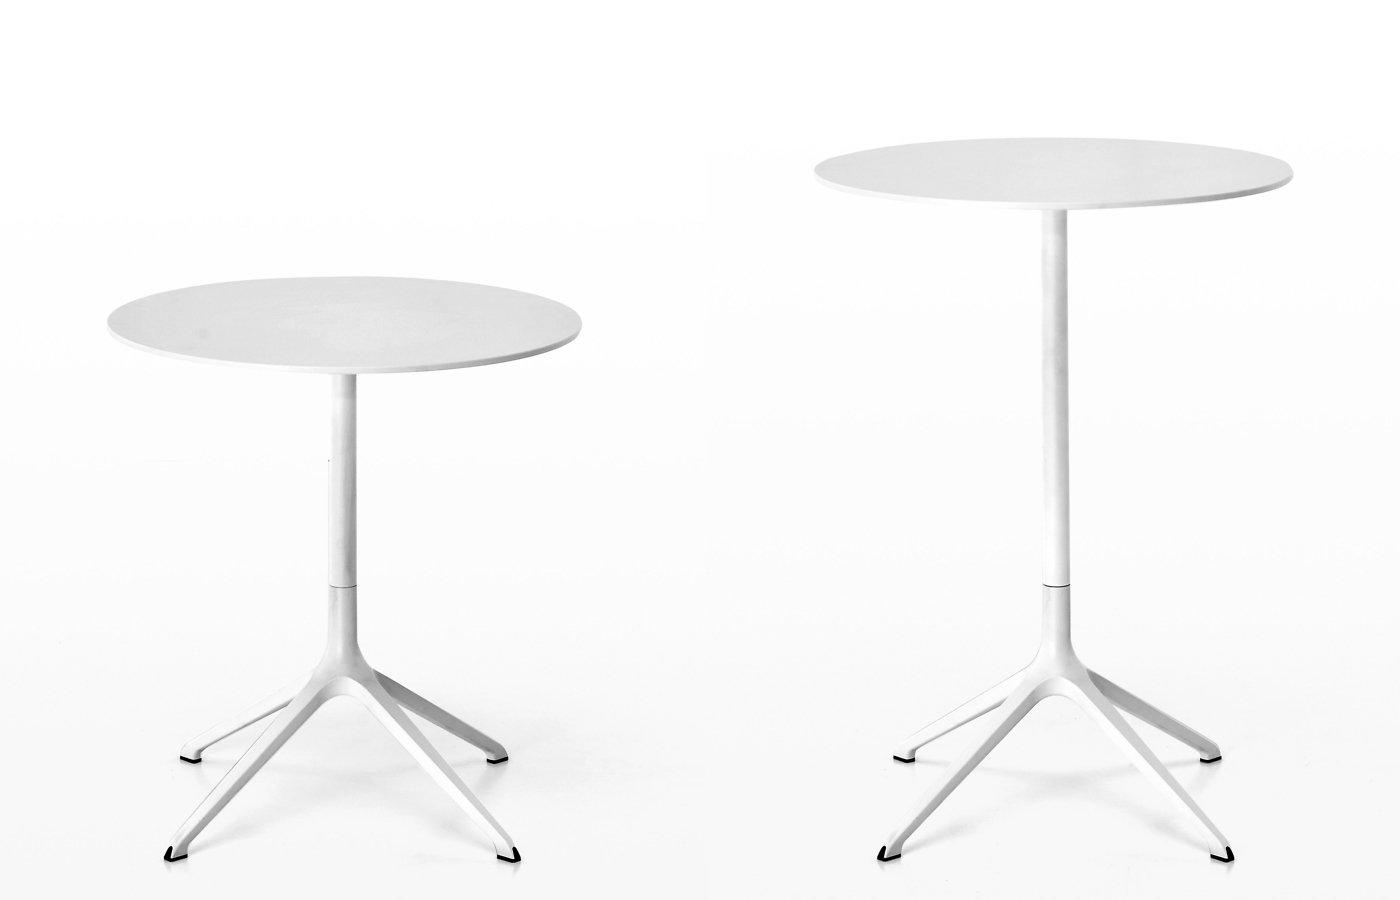 Elephant Table bar from Kristalia, designed by Neuland